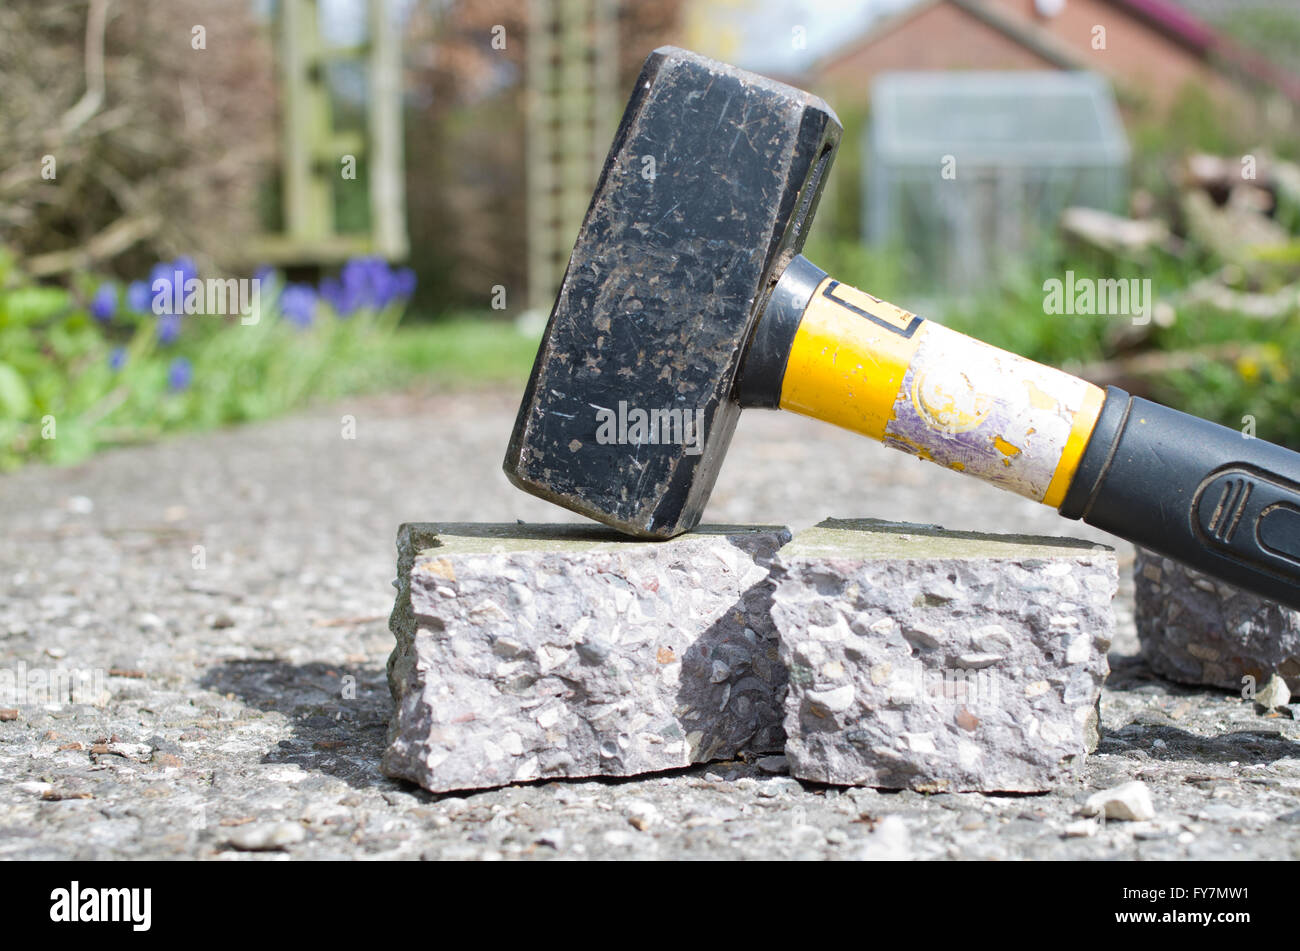 Hammer breaking up concrete - Stock Image